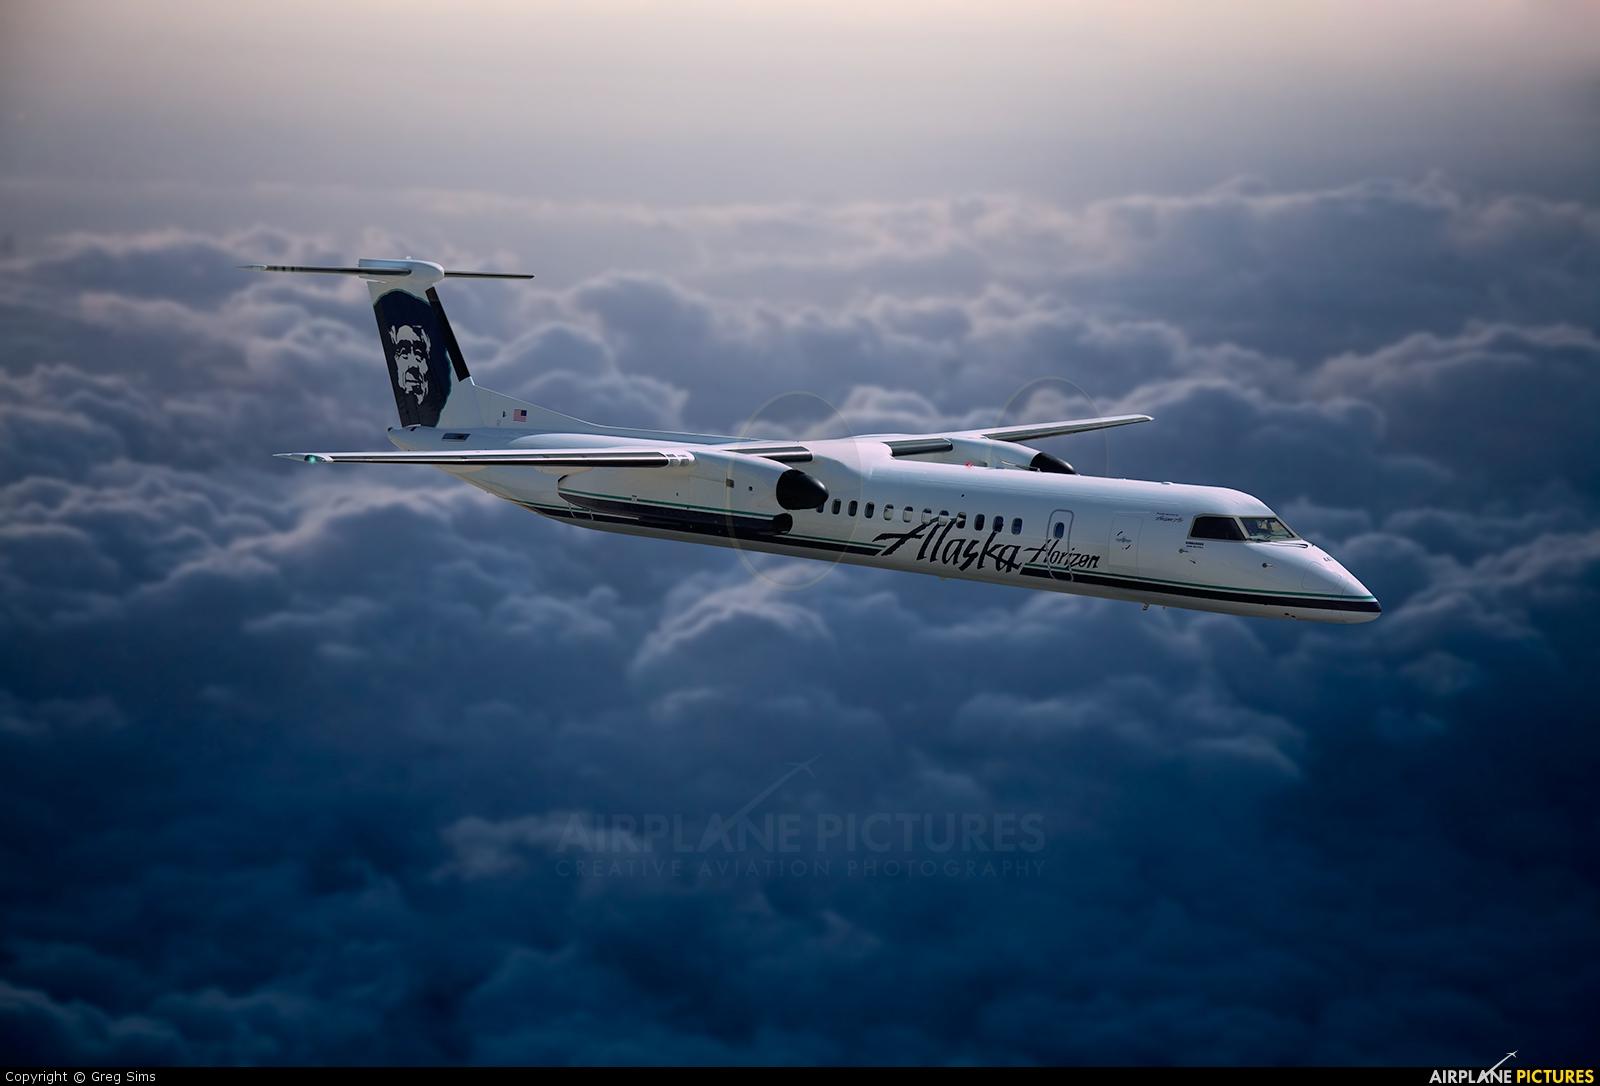 Alaska Airlines - Horizon Air - aircraft at In Flight - Alaska